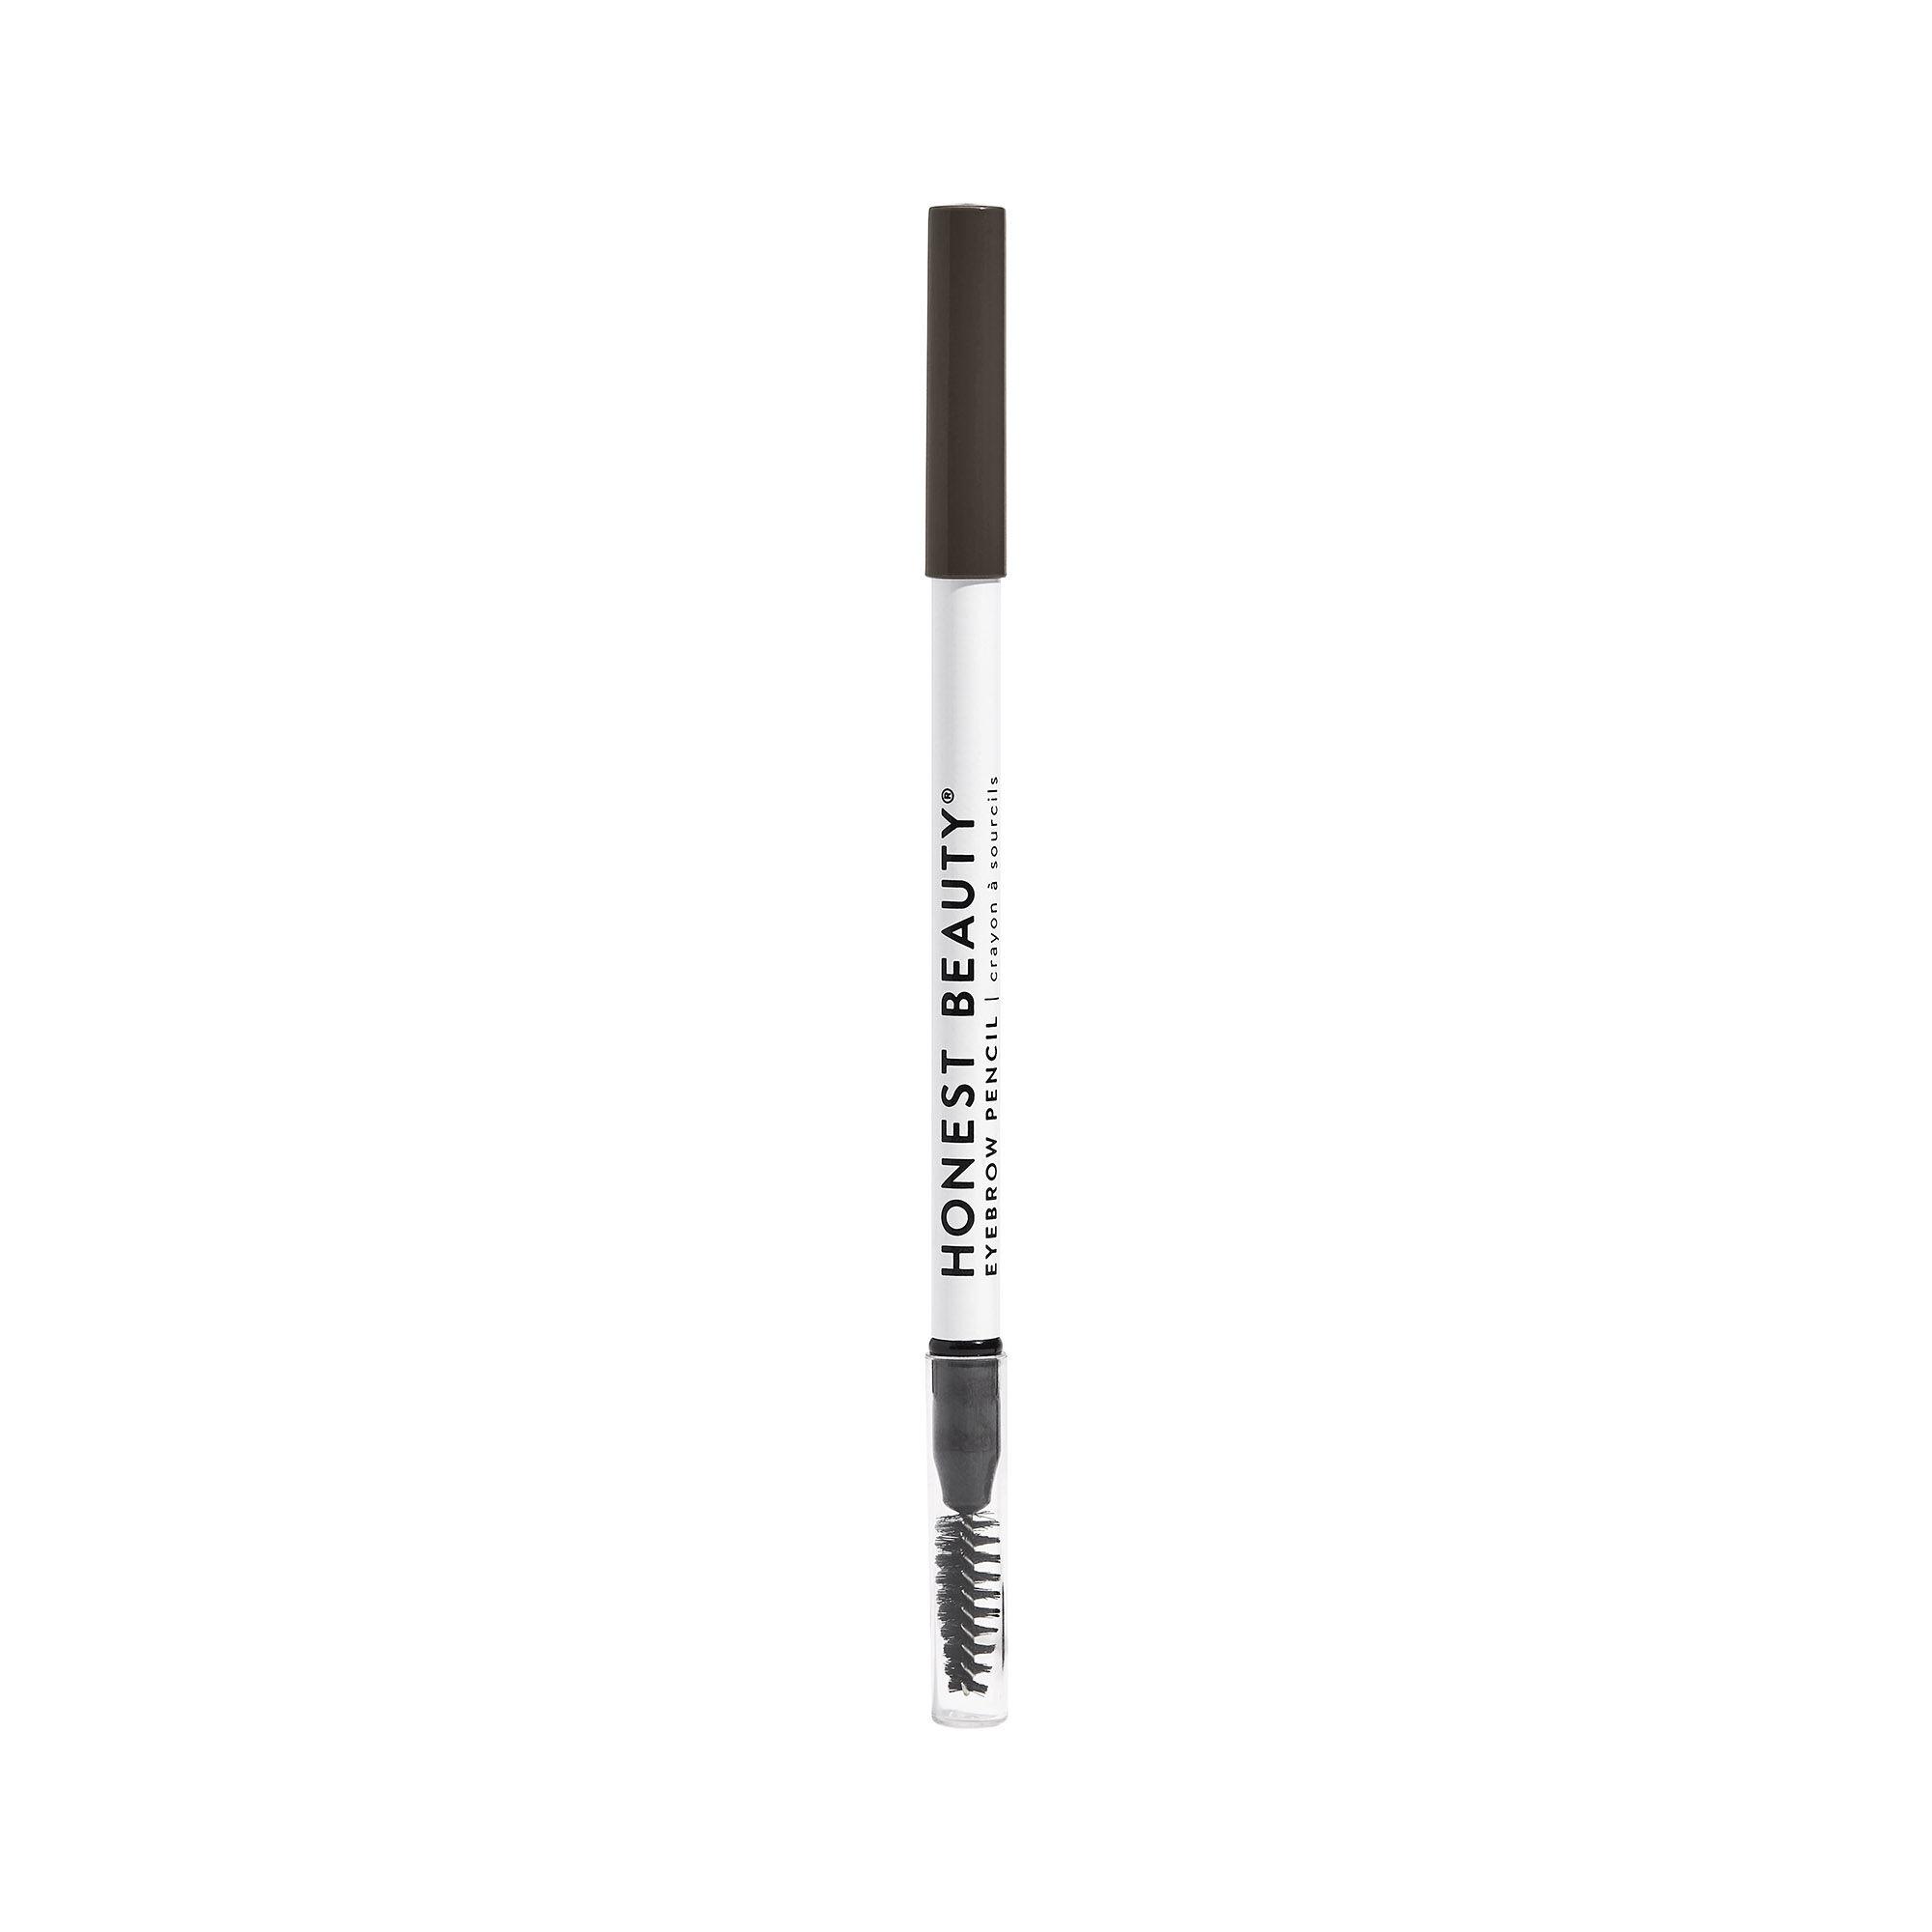 Eyebrow Pencil, Warm Brunette